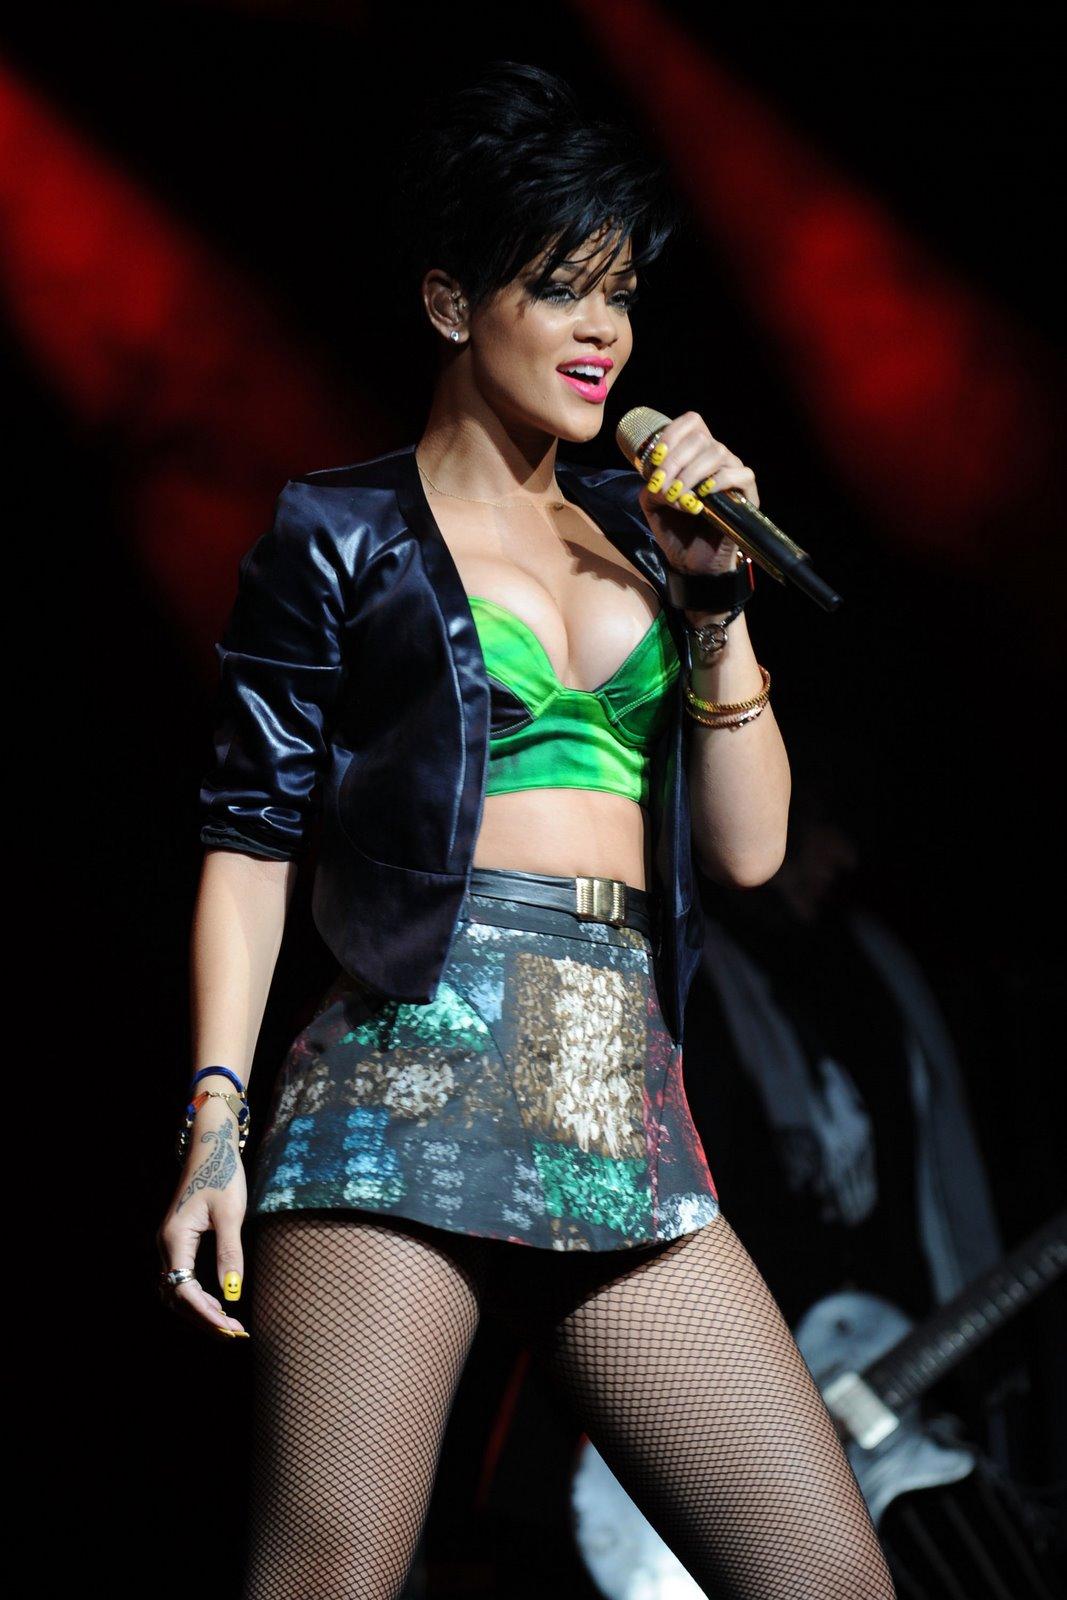 http://2.bp.blogspot.com/_sDp_pE3-DTc/SUdhFiFmhhI/AAAAAAAAG5E/-IZ73iEKA2A/s1600/Rihanna_performs_at_the_Y_100_Jingle_Ball_in_Sunrise-1_122_903lo.jpg